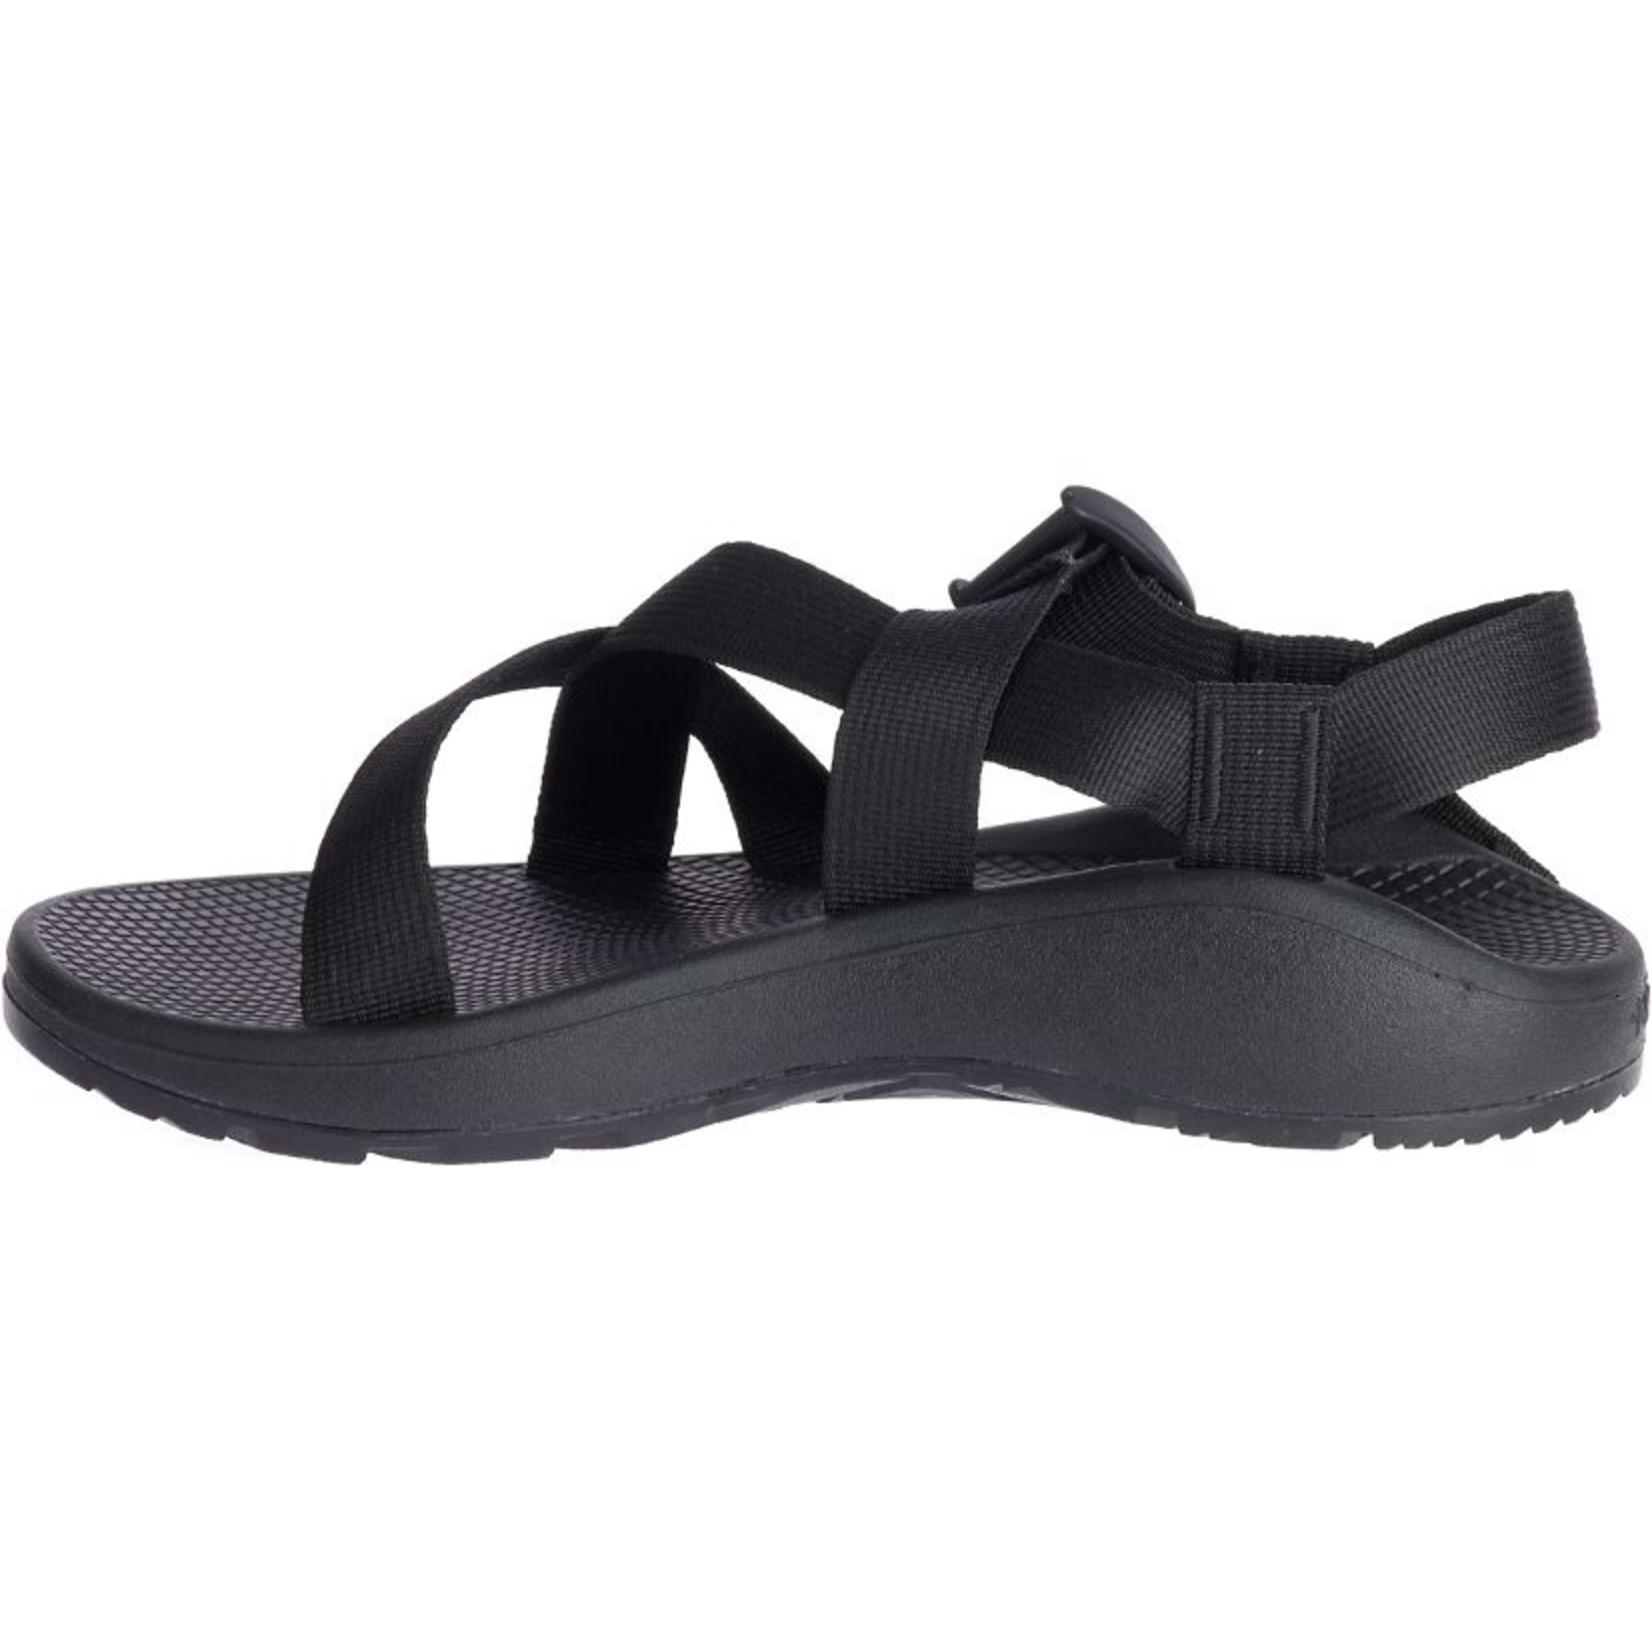 Chaco Chaco Men's Z/Cloud Sandals